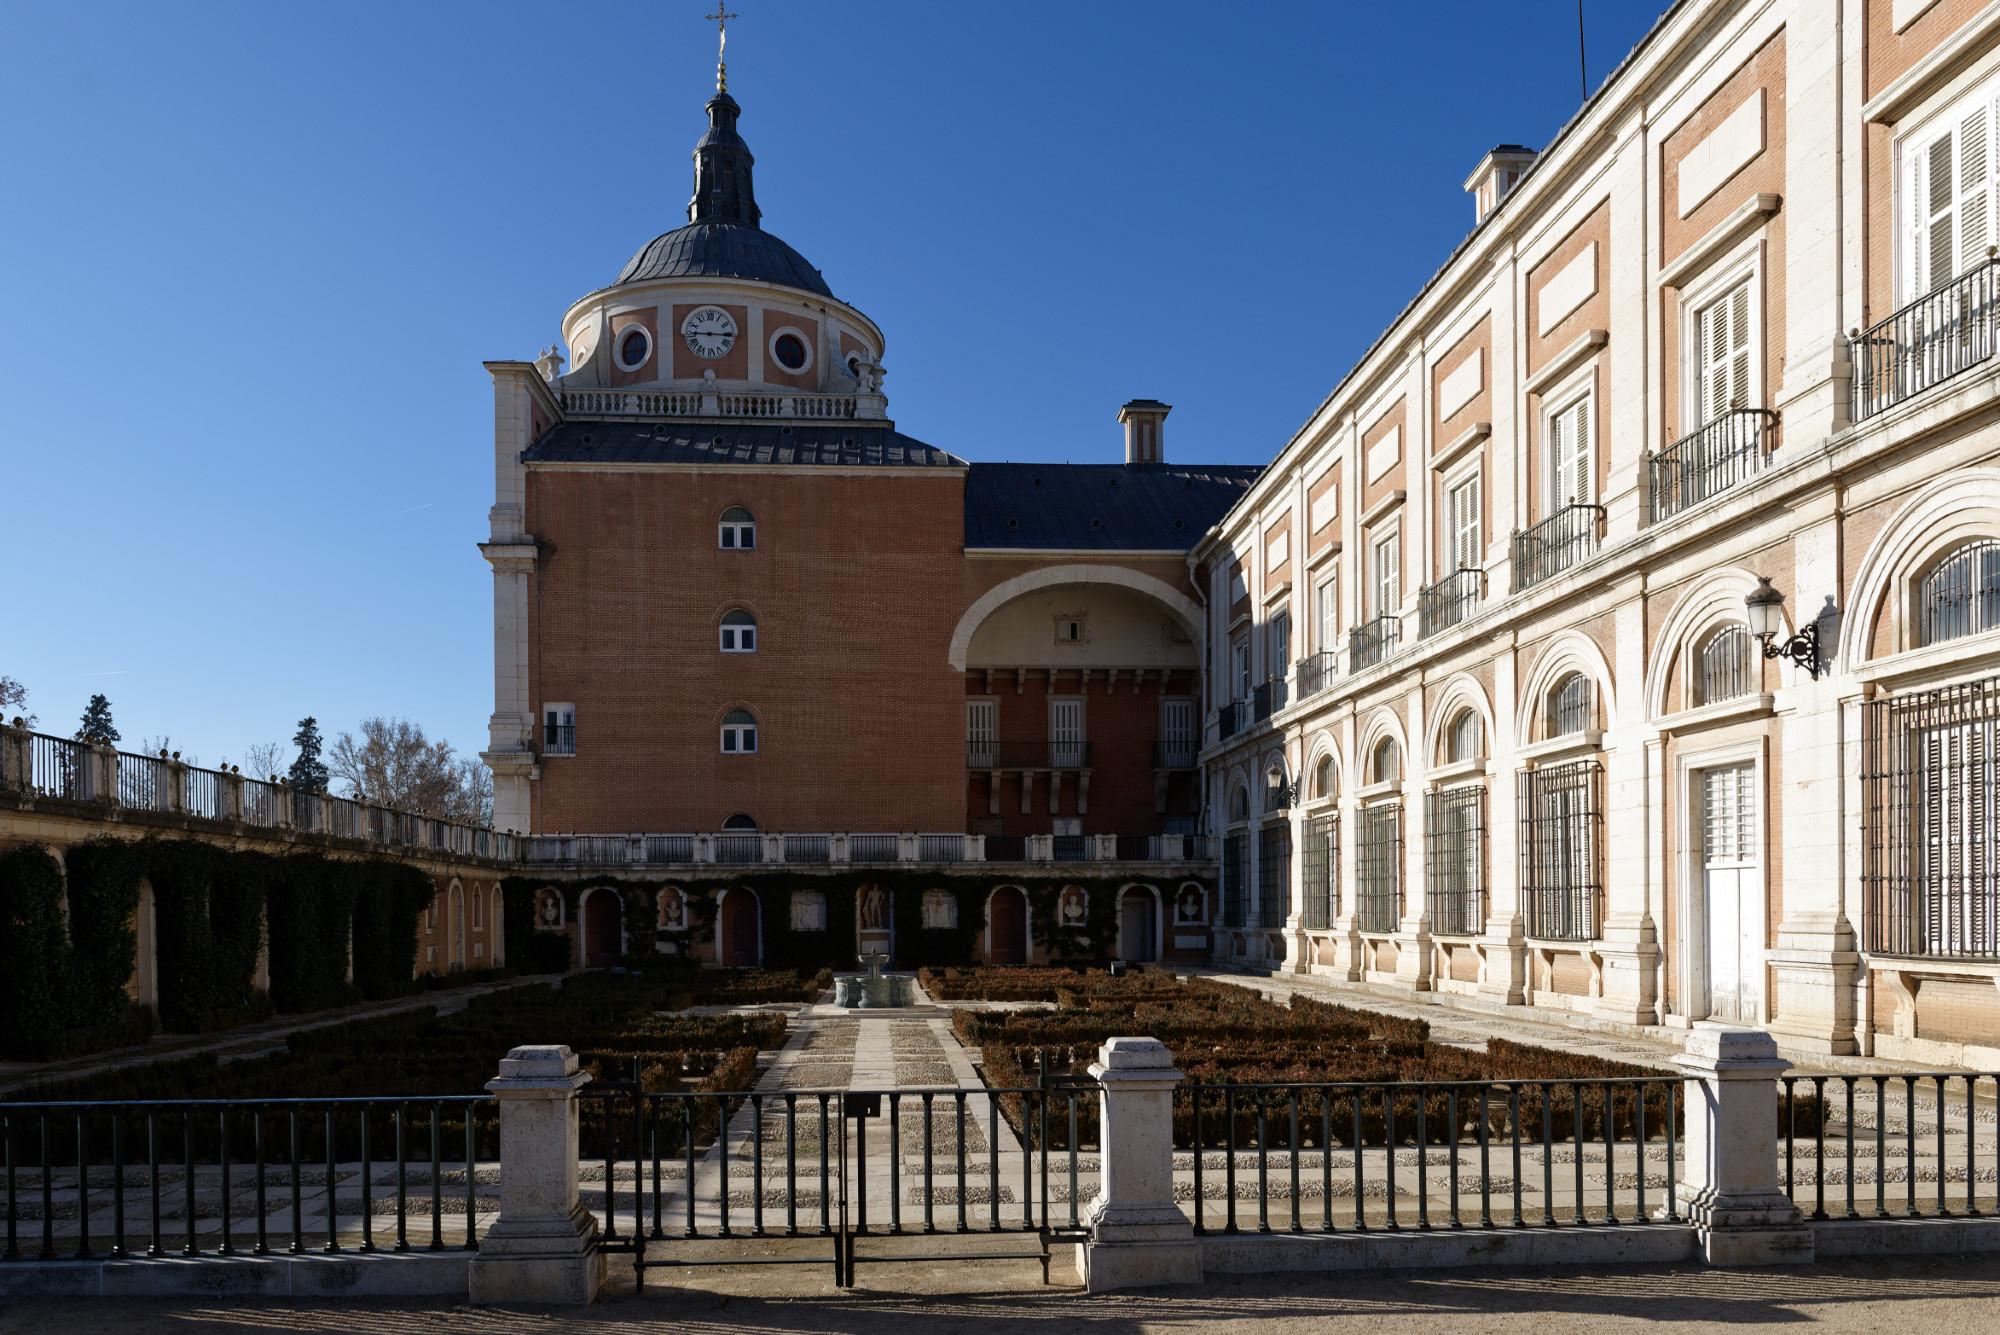 171221-Aranjuez (Castille) (38)